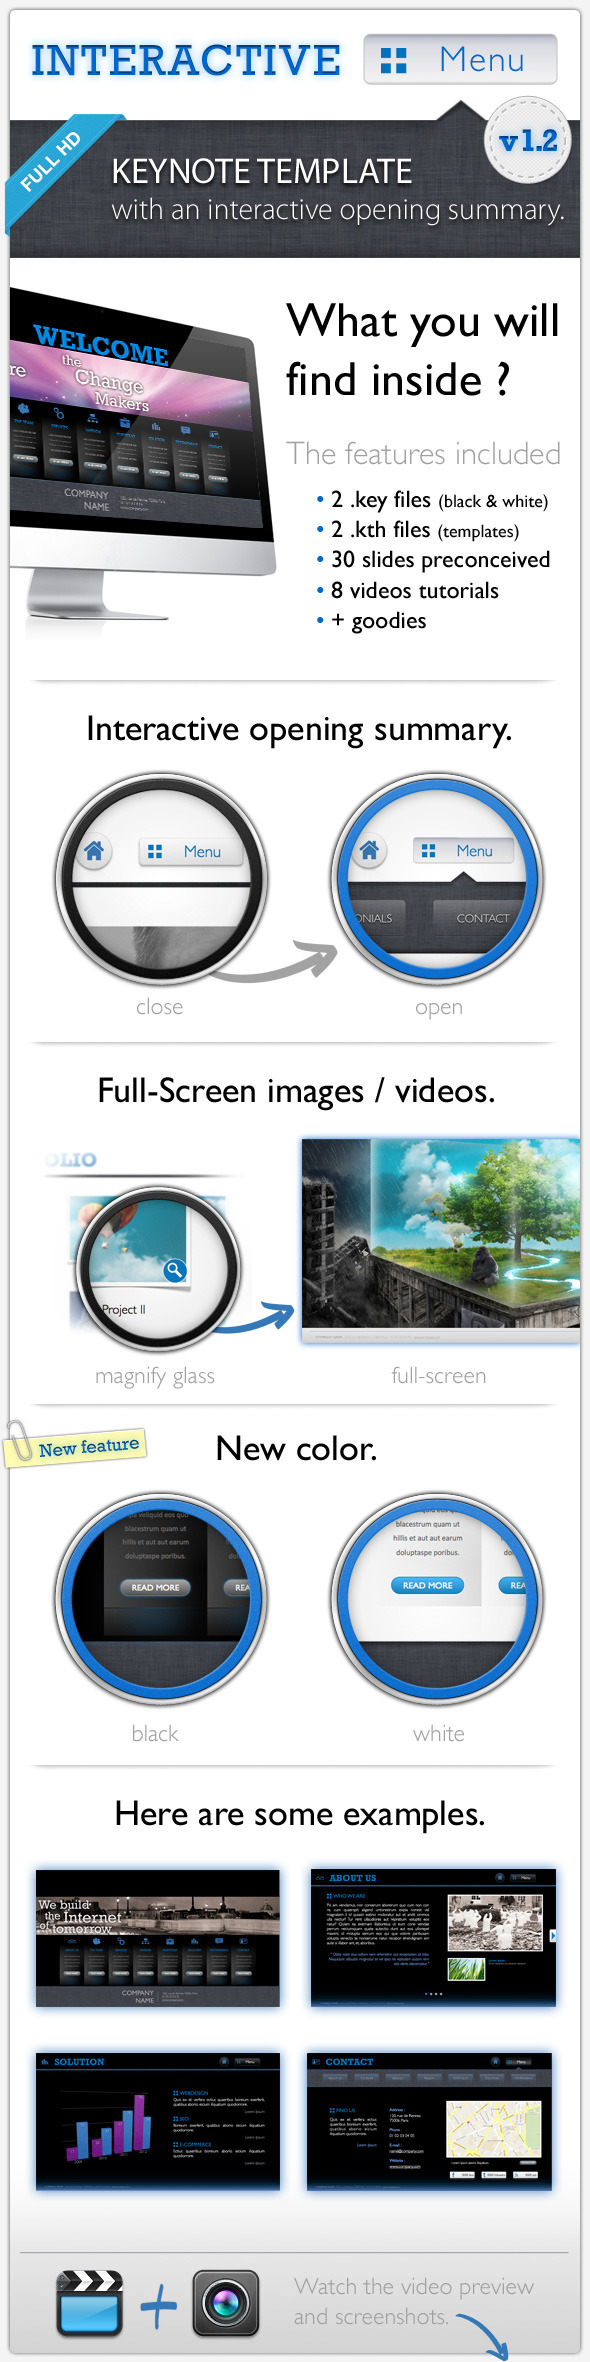 Interactive Menu - Keynote Template Full HD - Business Keynote Templates